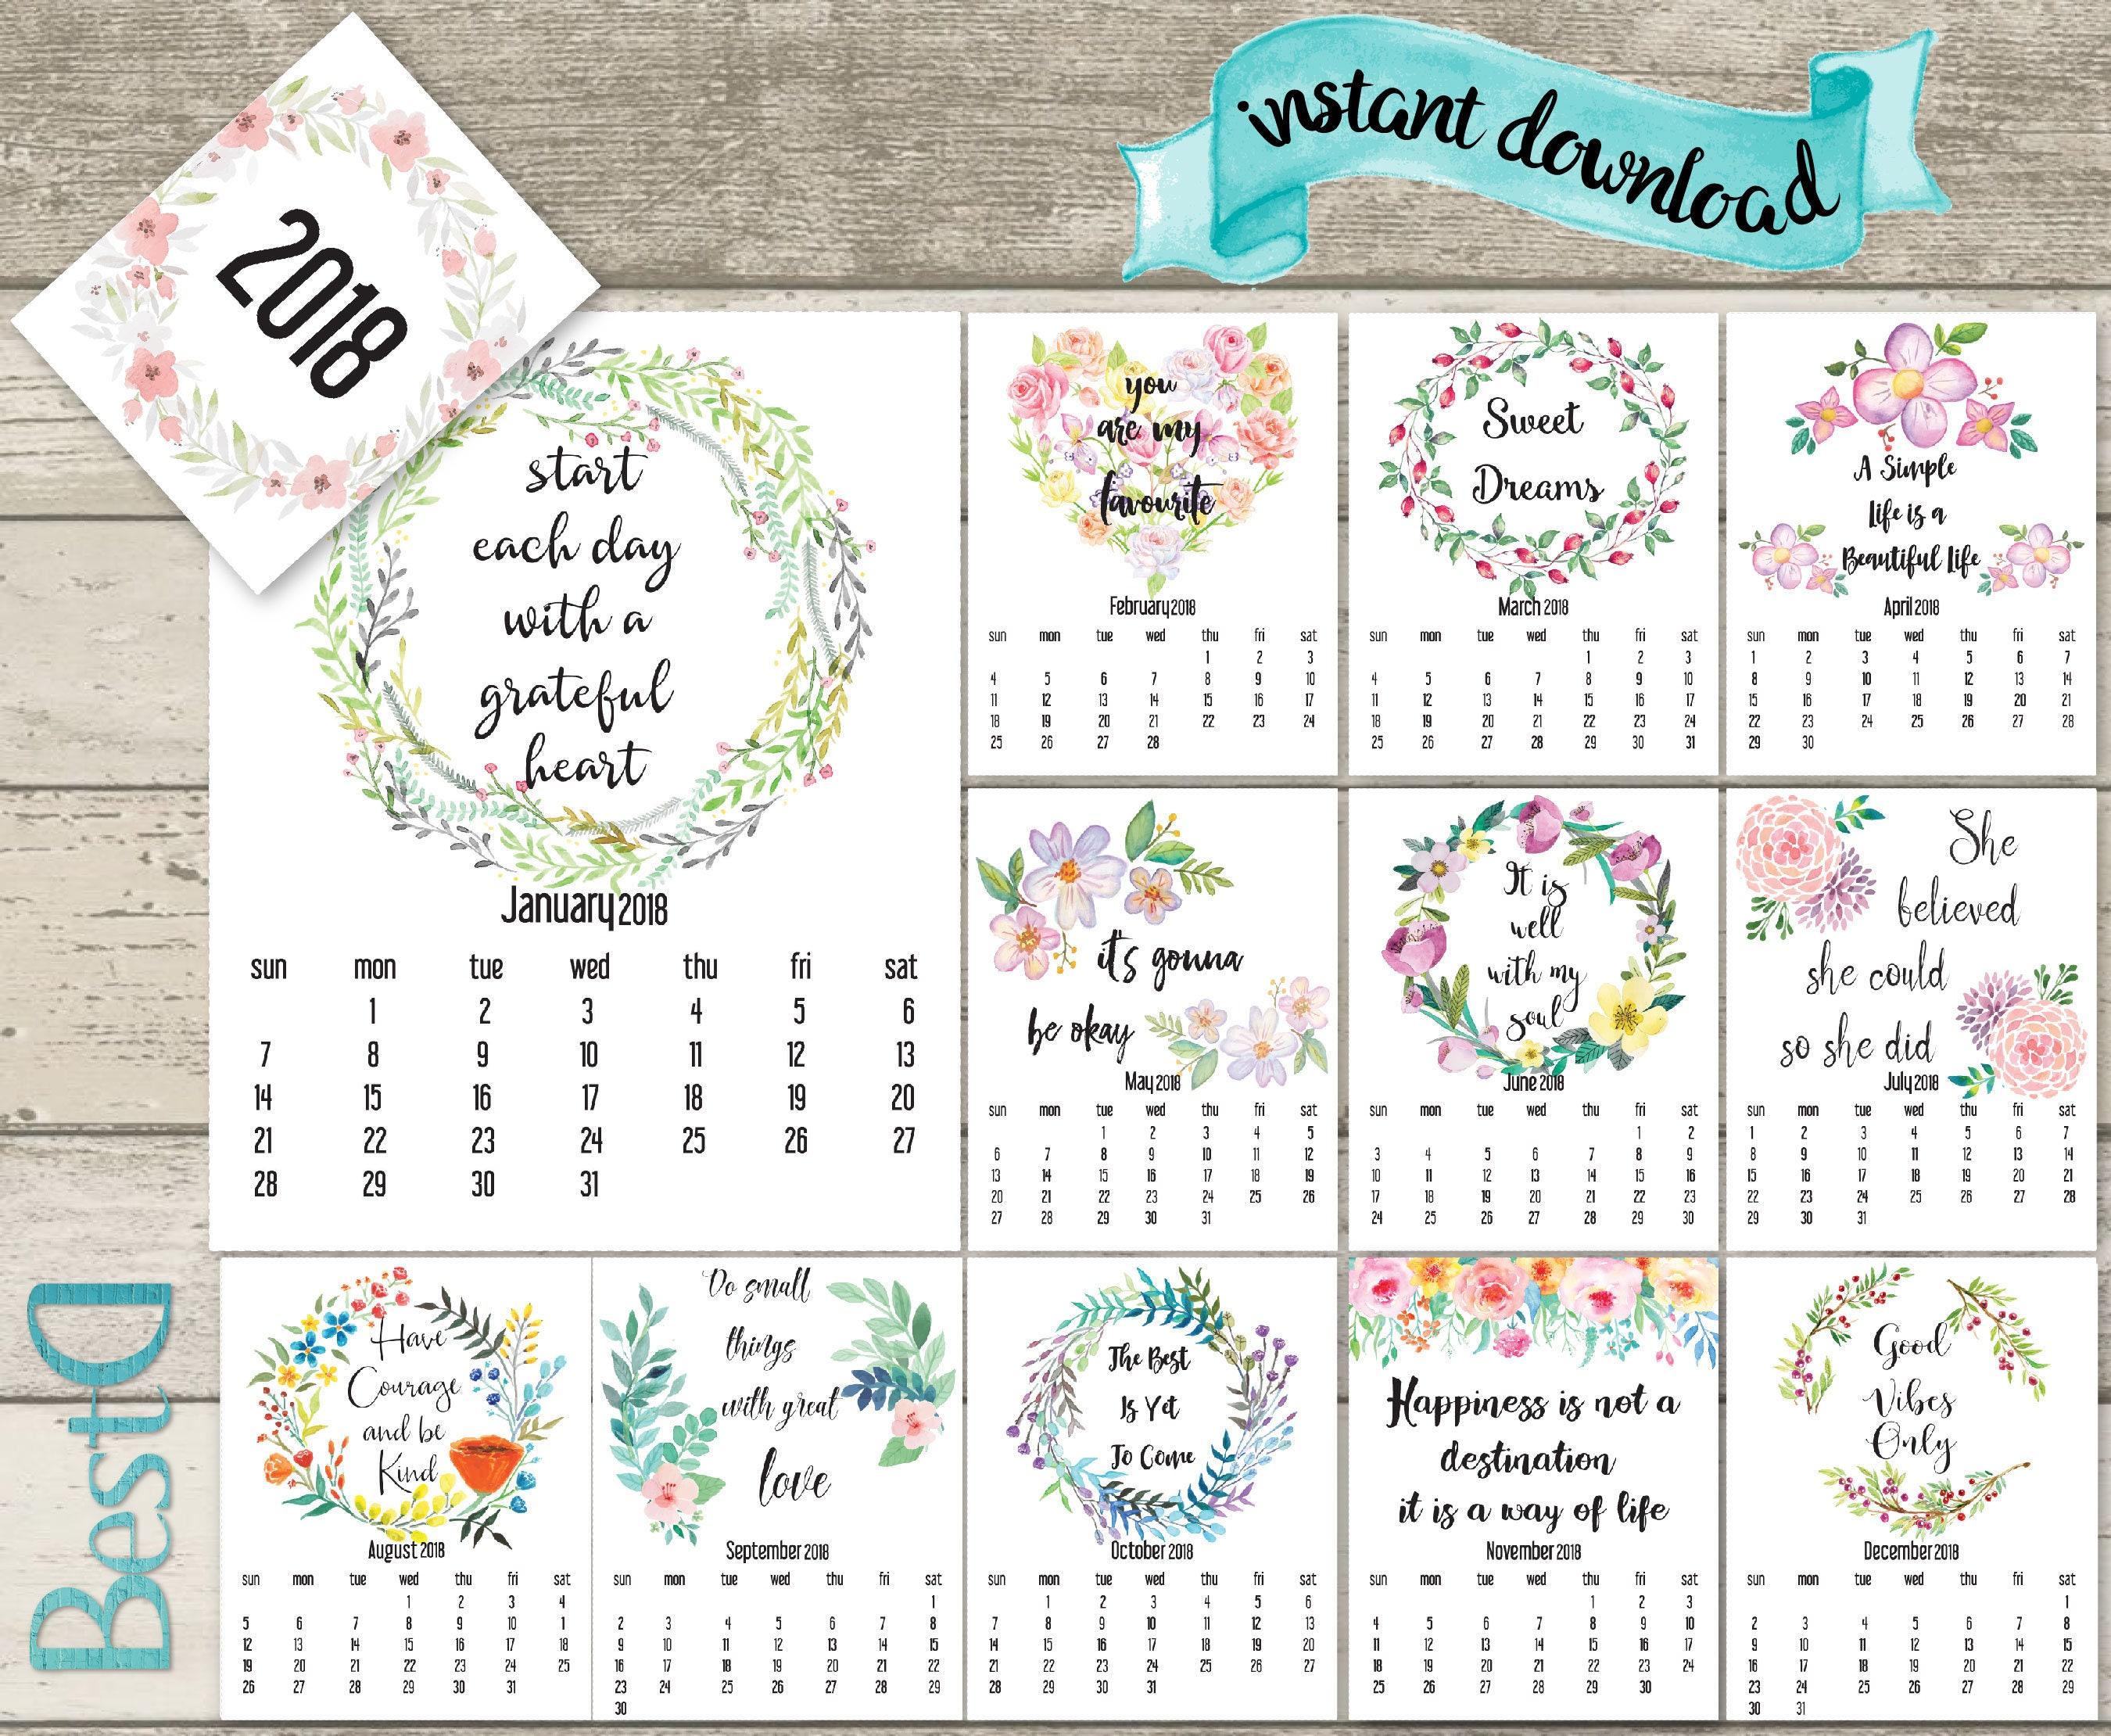 2018 printable planner calendarwatercolor planner